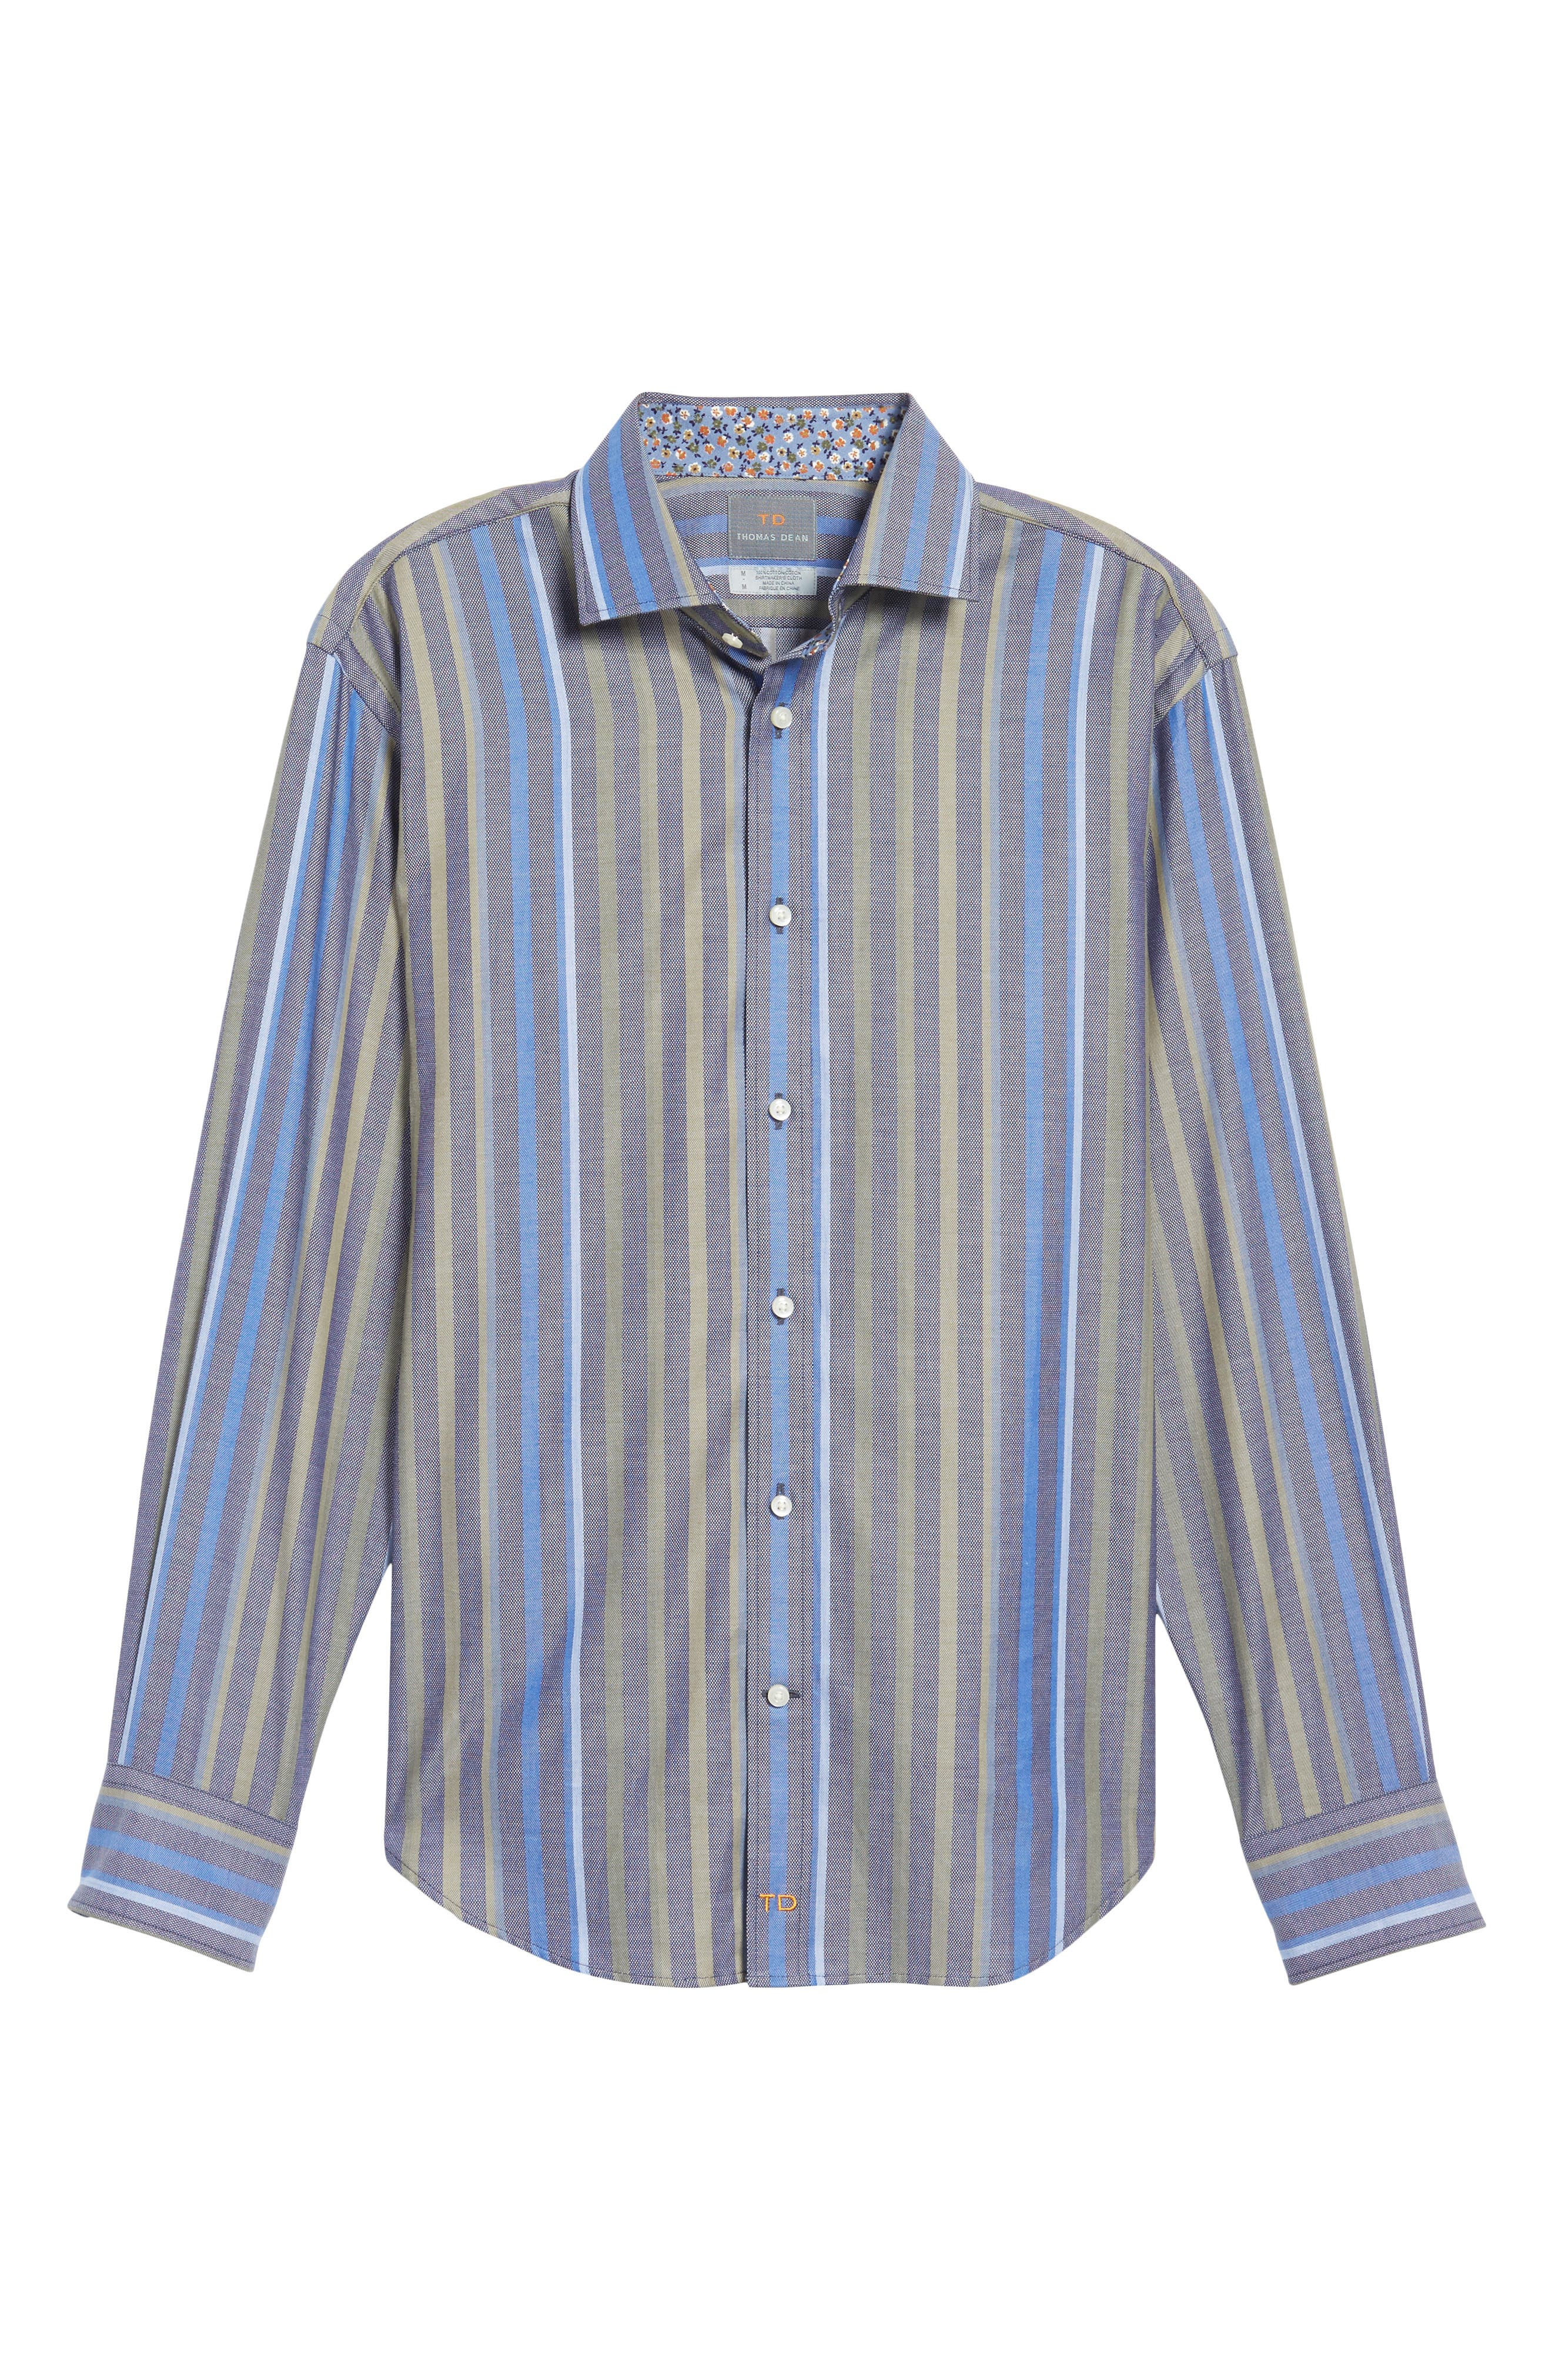 Regular Fit Stripe Sport Shirt,                             Alternate thumbnail 6, color,                             300